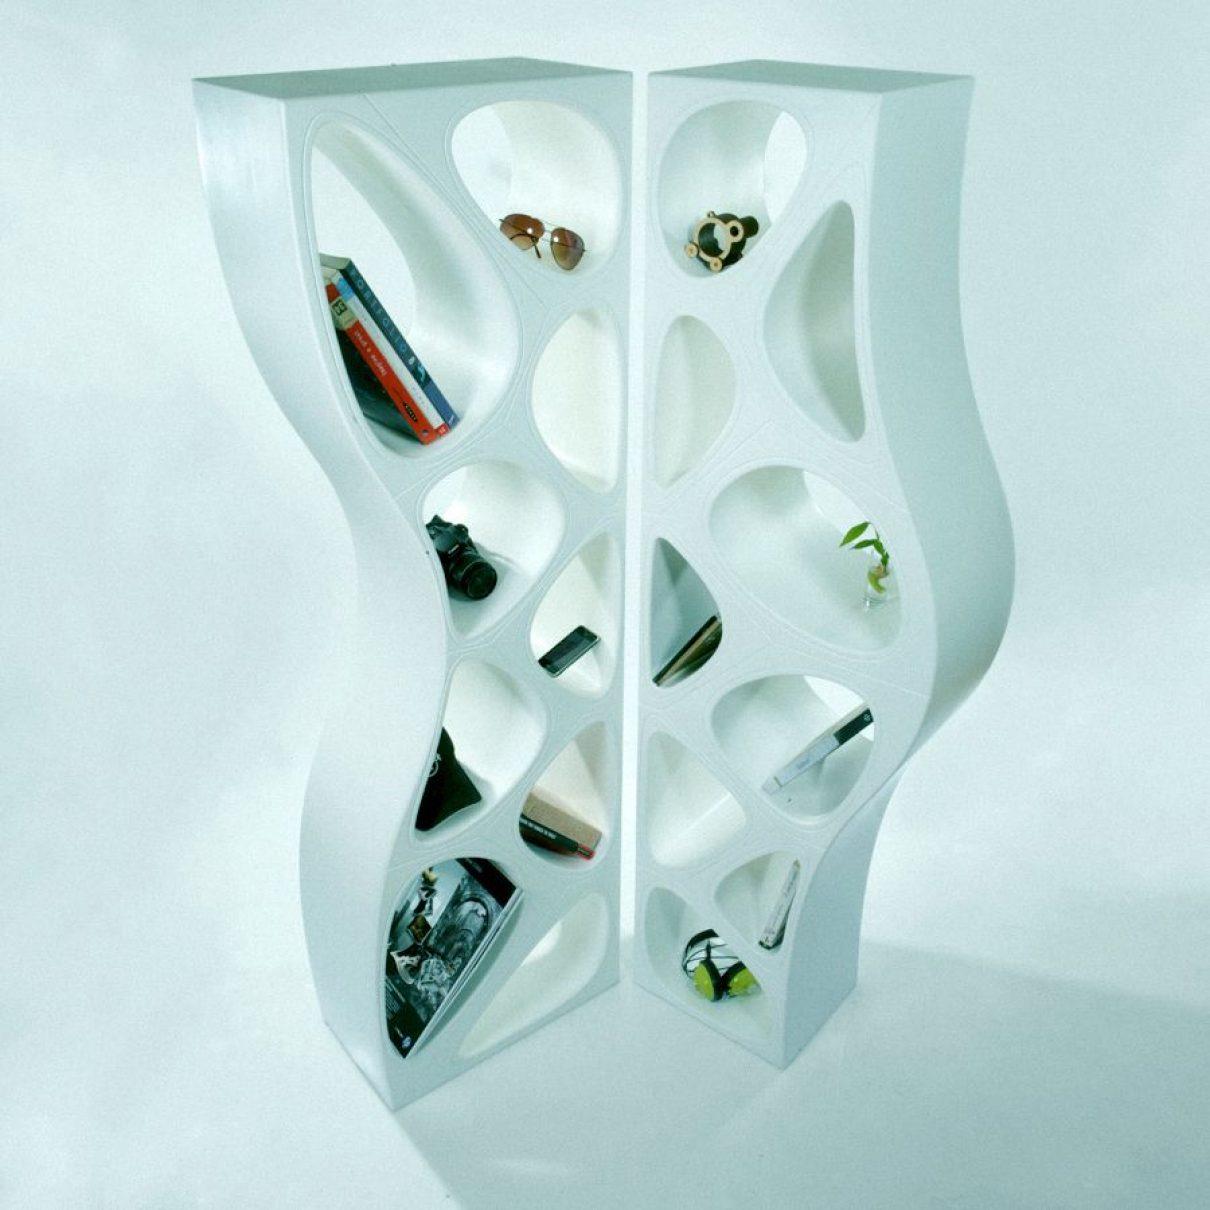 Parametrisch meubel: schots en scheef